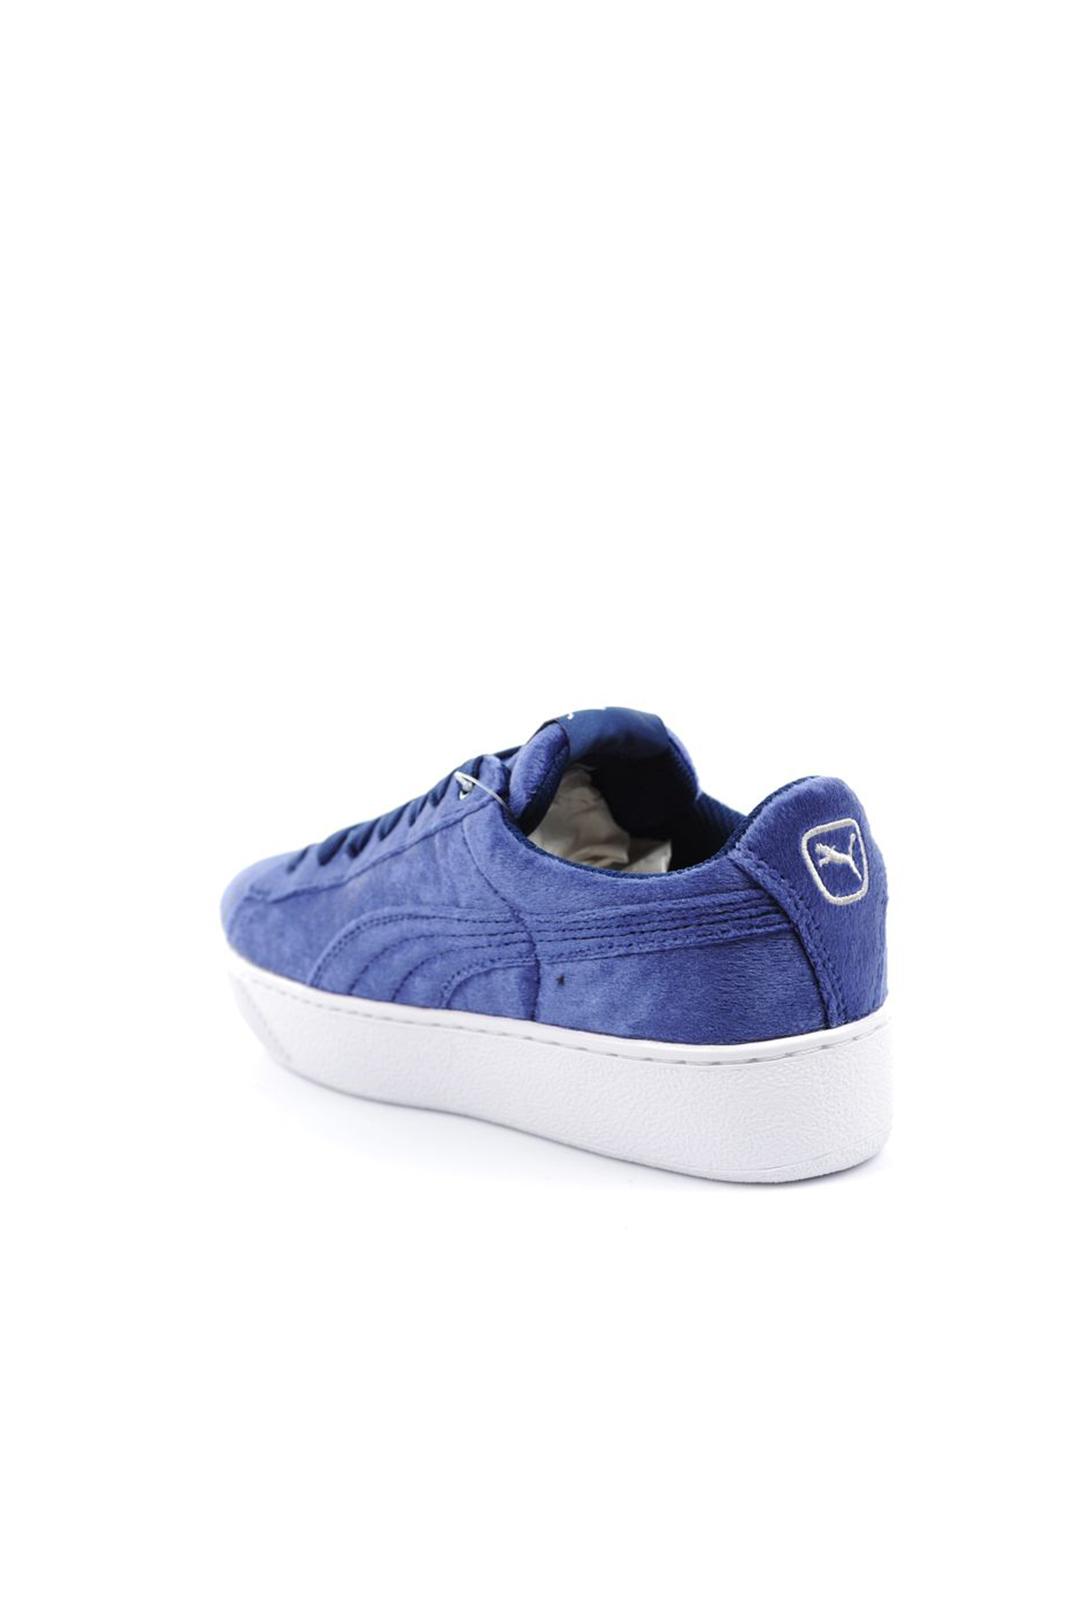 Puma BLUE DEPTHS 364978 01 FEMME Baskets Sneakers qXwOFEA